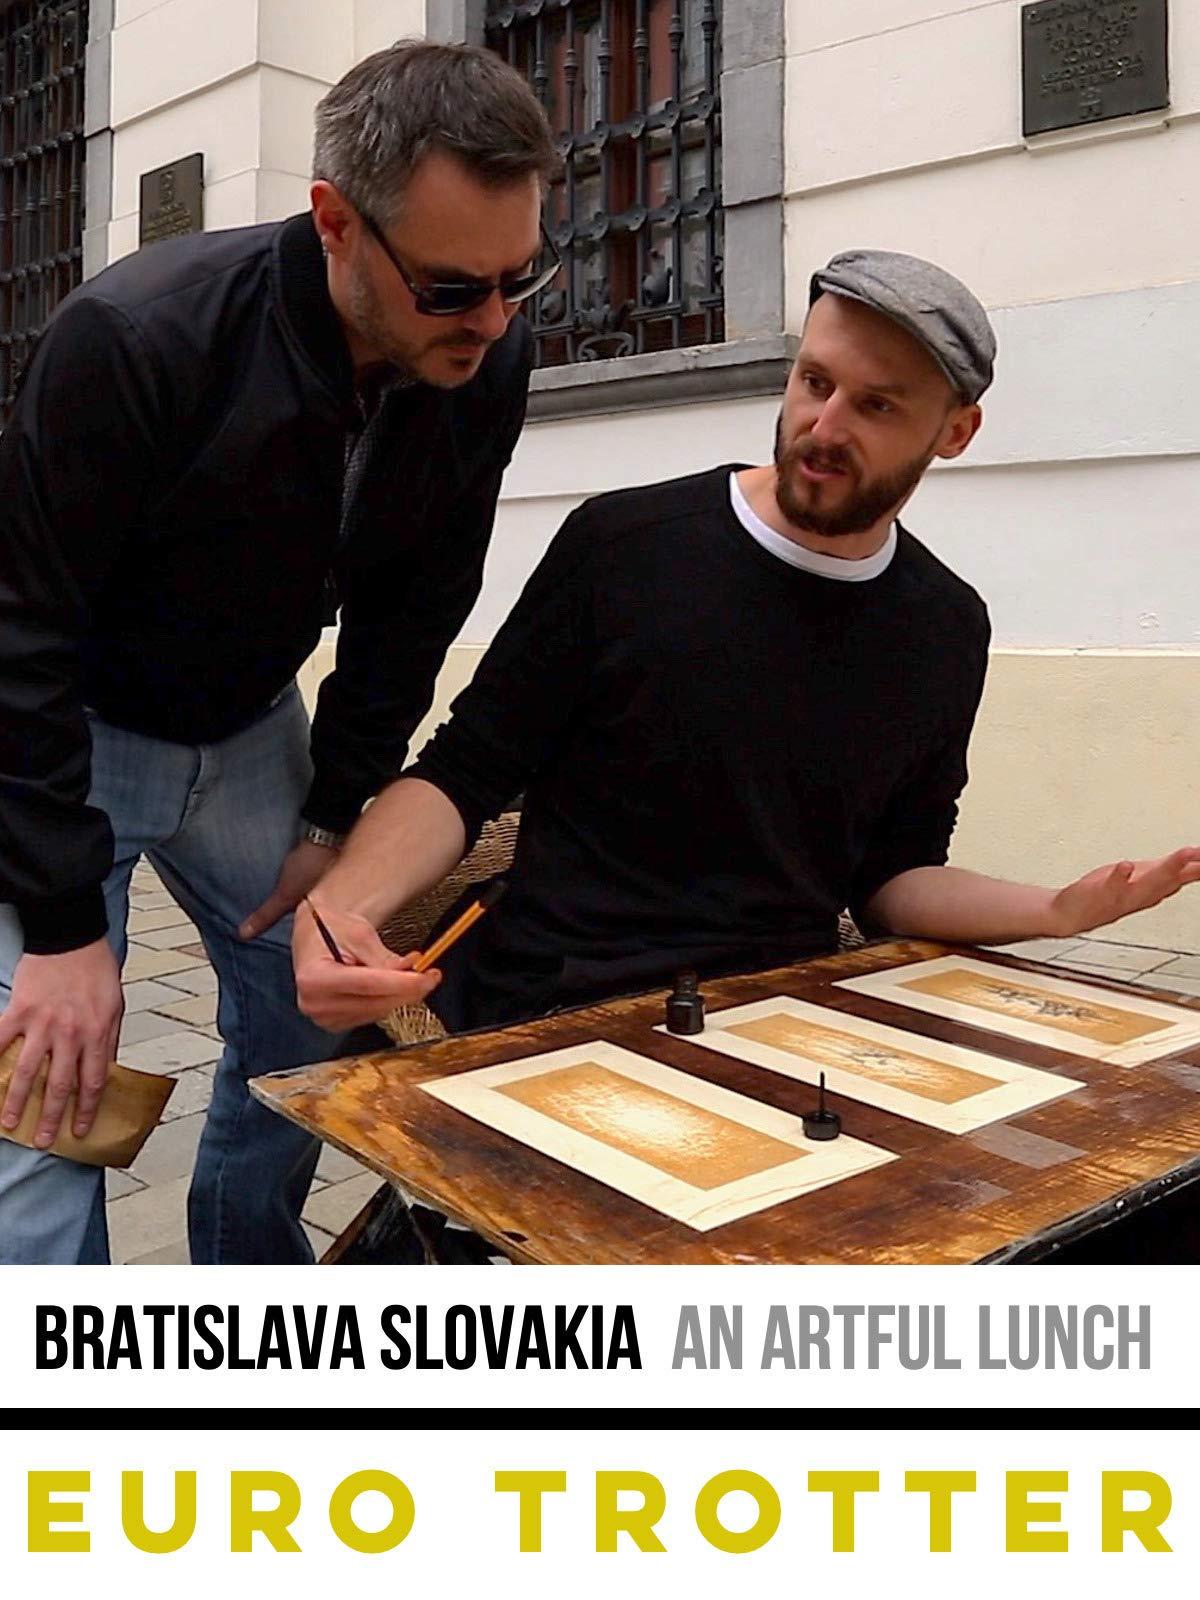 Bratislava An Artful Lunch